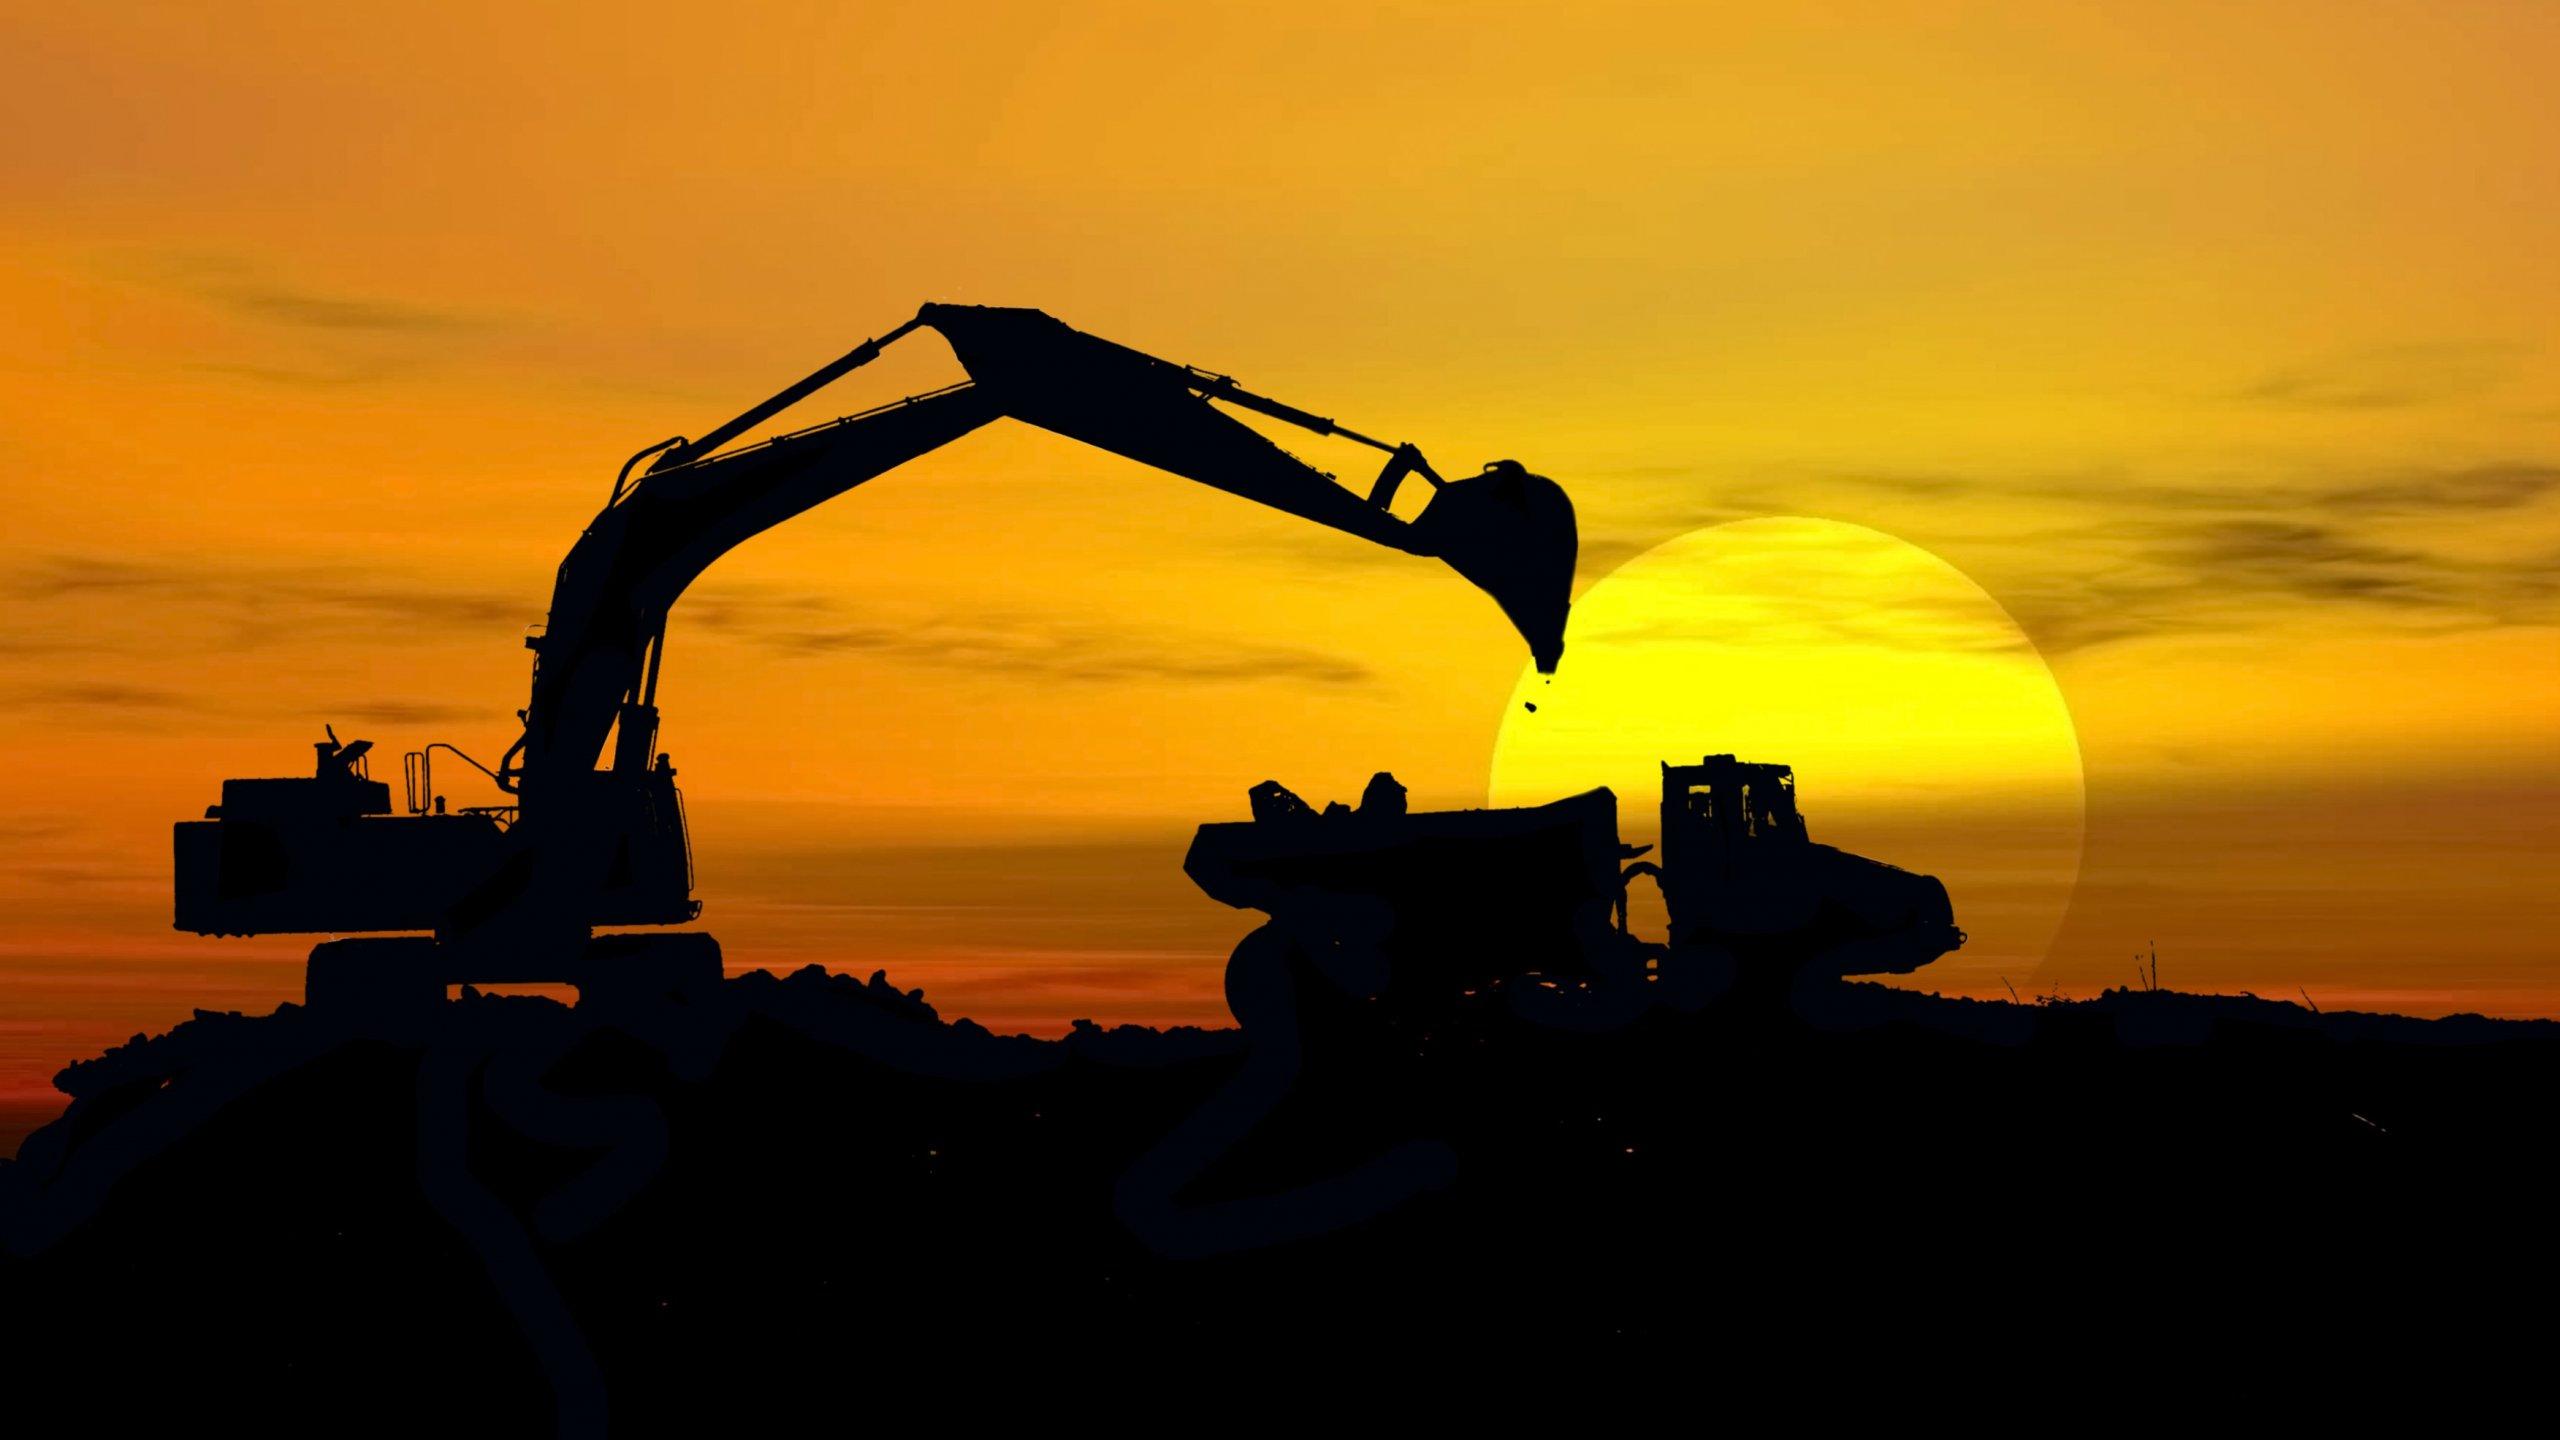 construction_work_building_job_profession_architecture_design_2560x1440